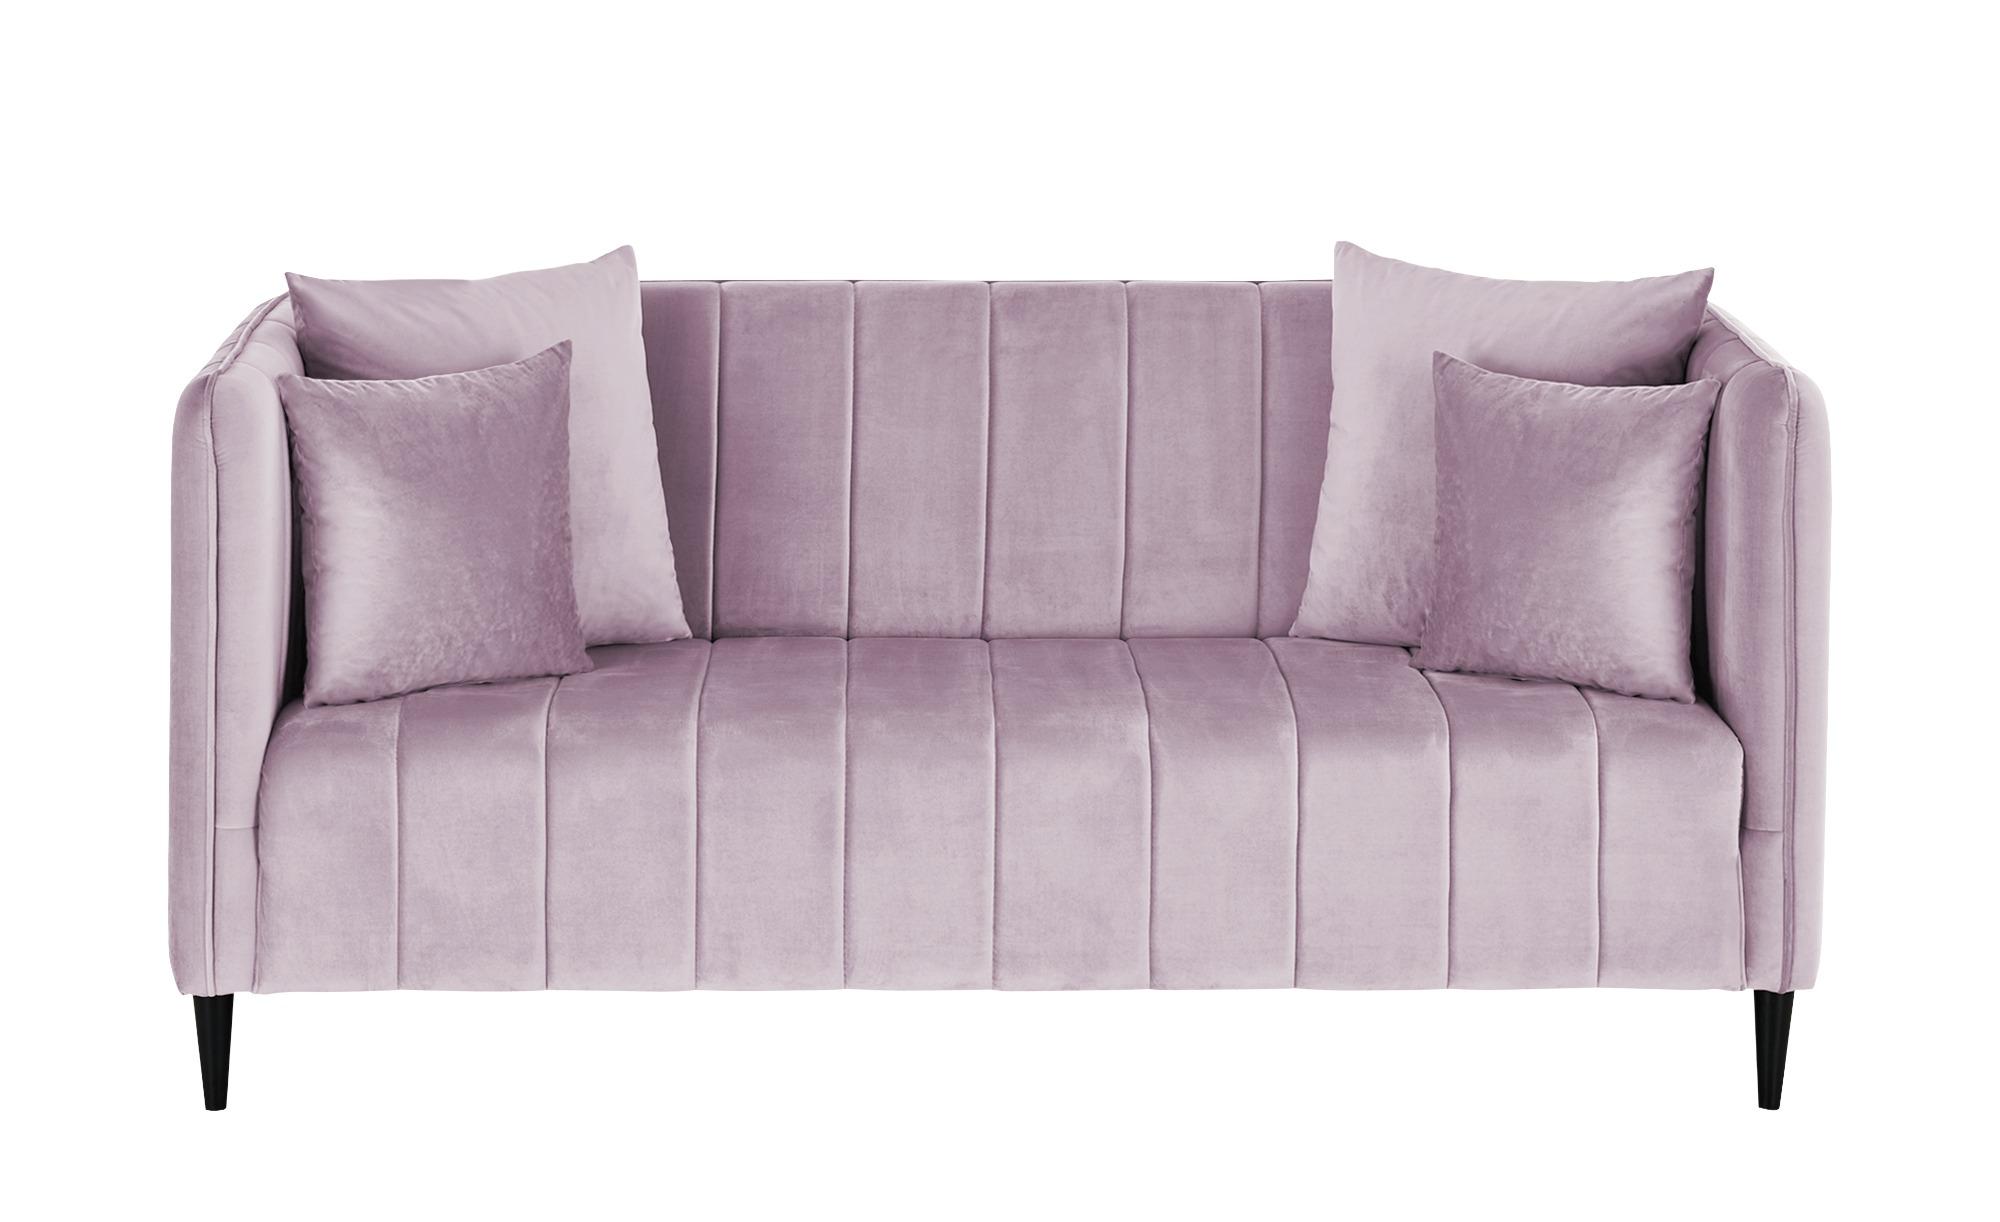 smart Sofa  Sara ¦ rosa/pink ¦ Maße (cm): B: 178 H: 82 T: 90 Polstermöbel > Sofas > 2-Sitzer - Höffner